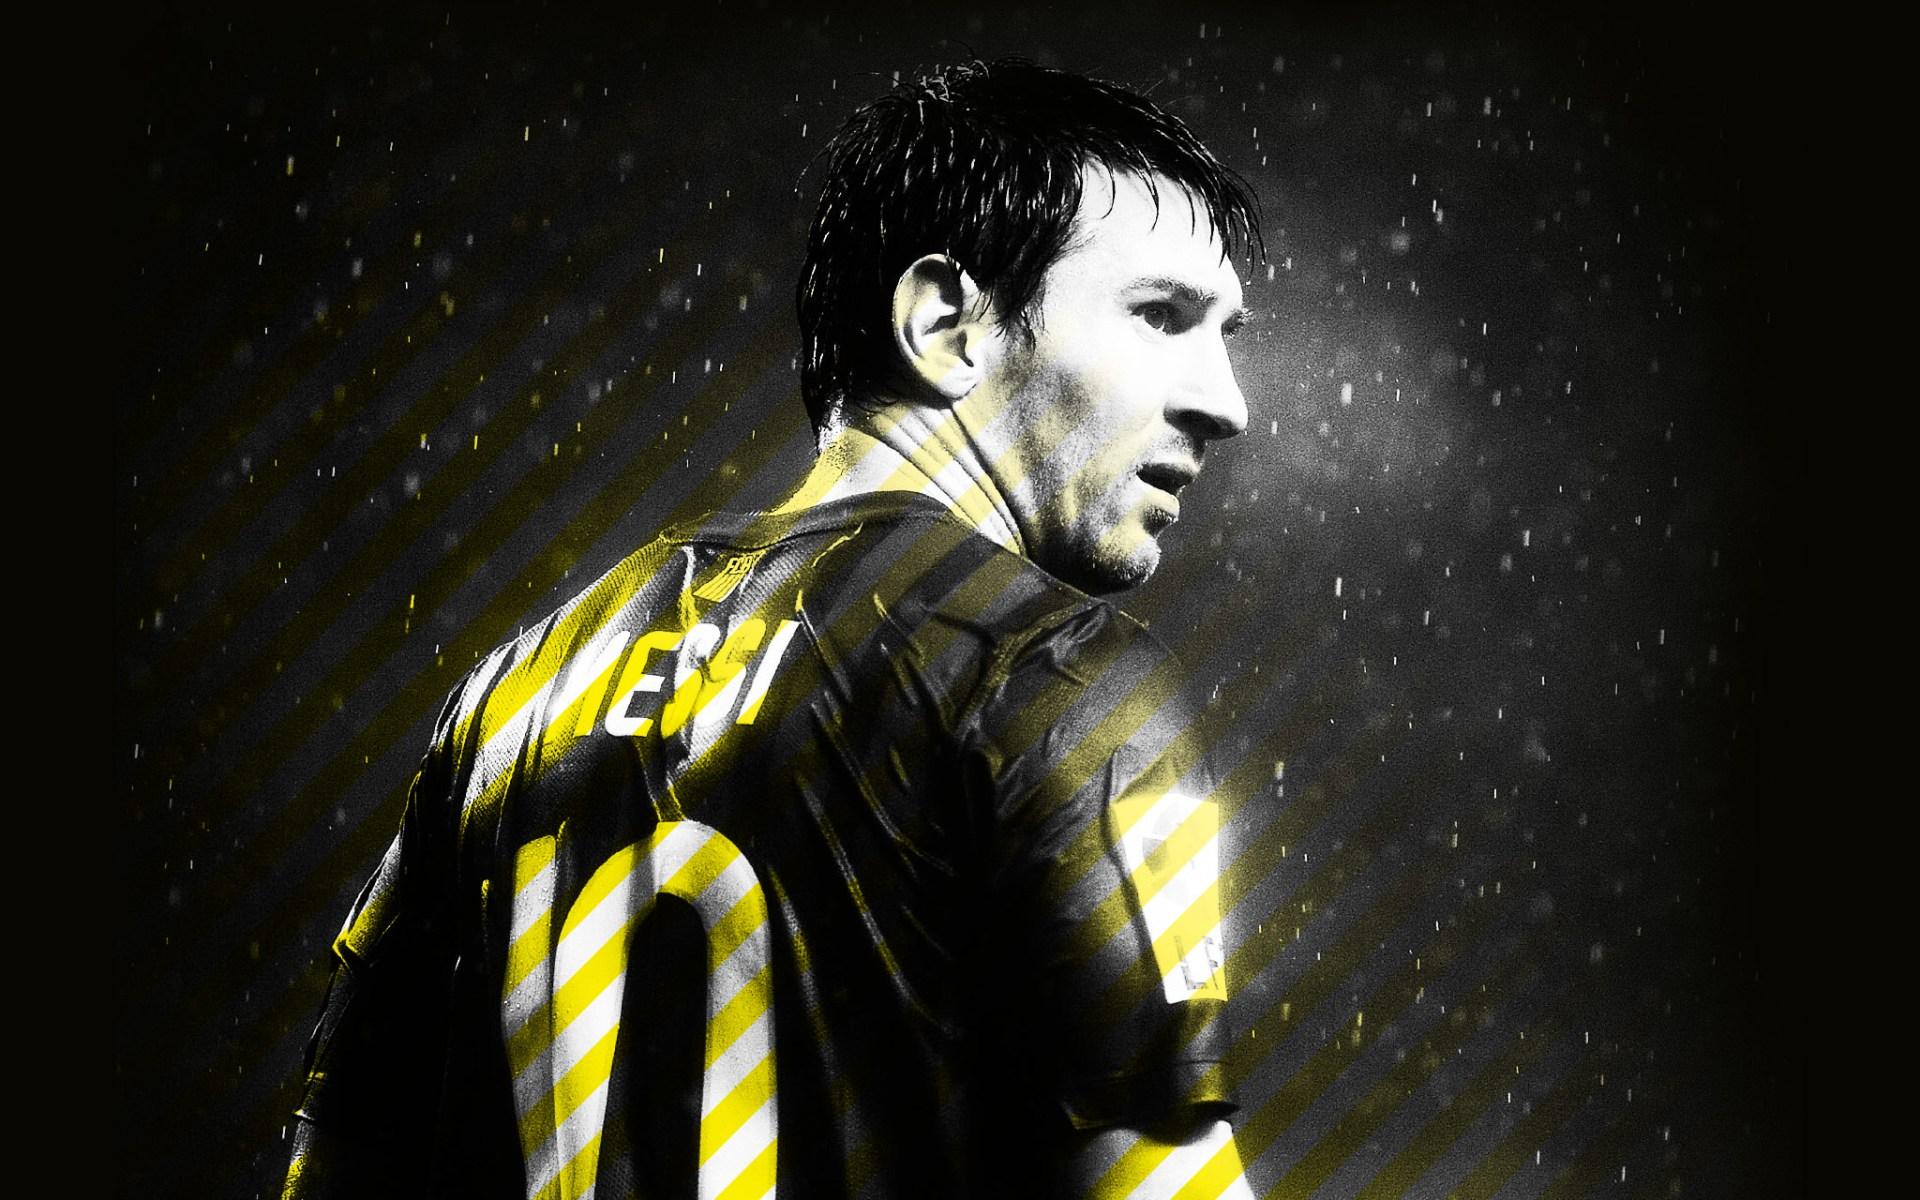 Wallpaper Lionel Messi 2014 1920x1200